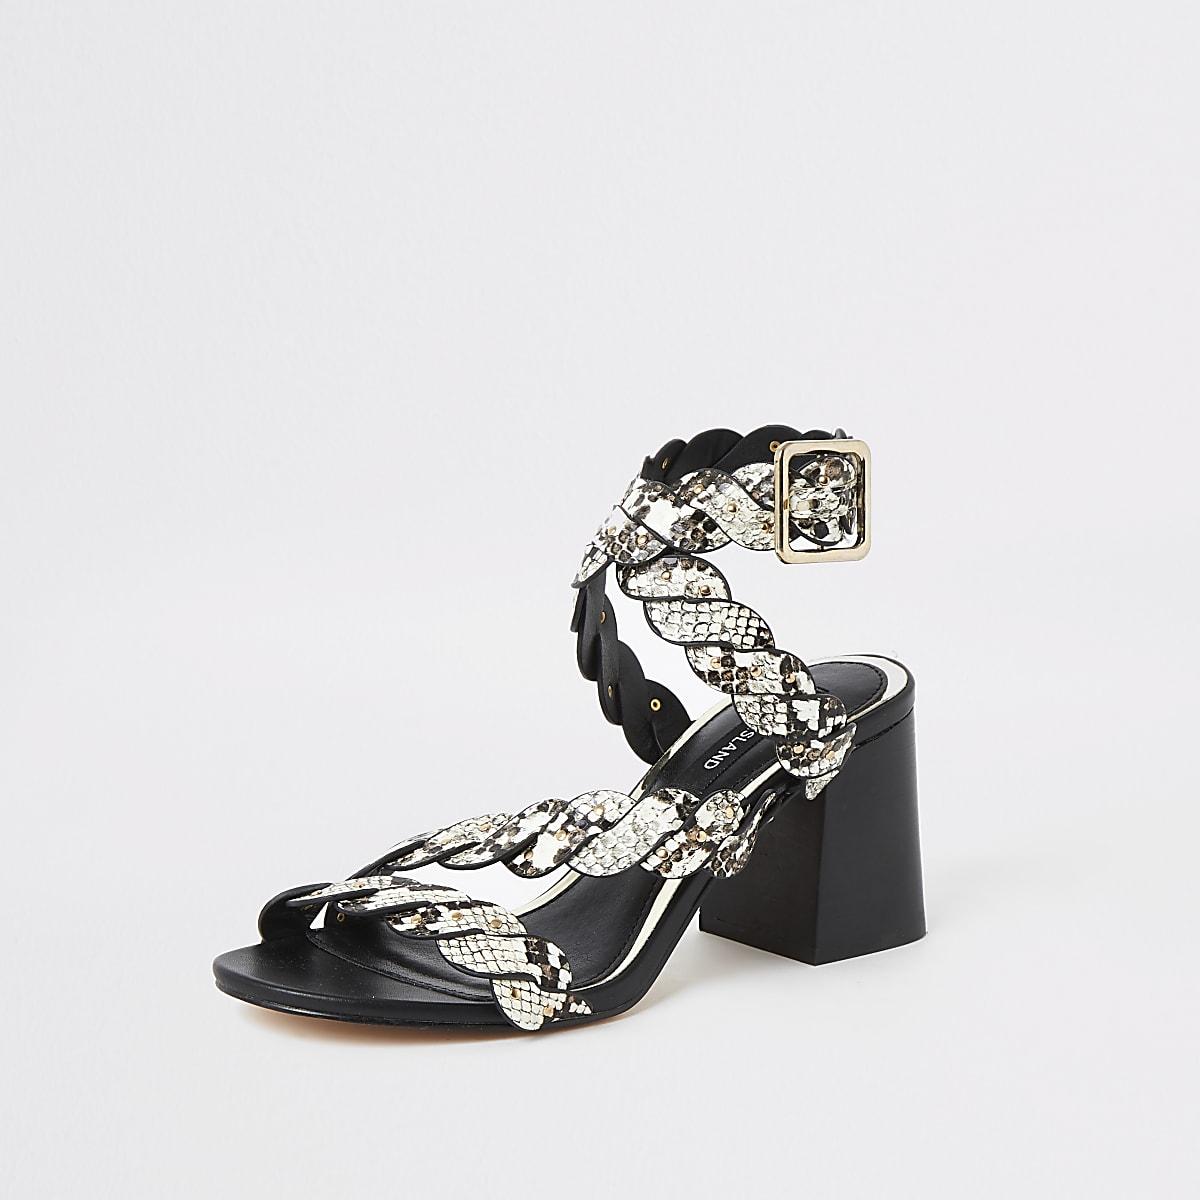 201a19f04b2 Grey snake print studded block heel sandals - Sandals - Shoes ...